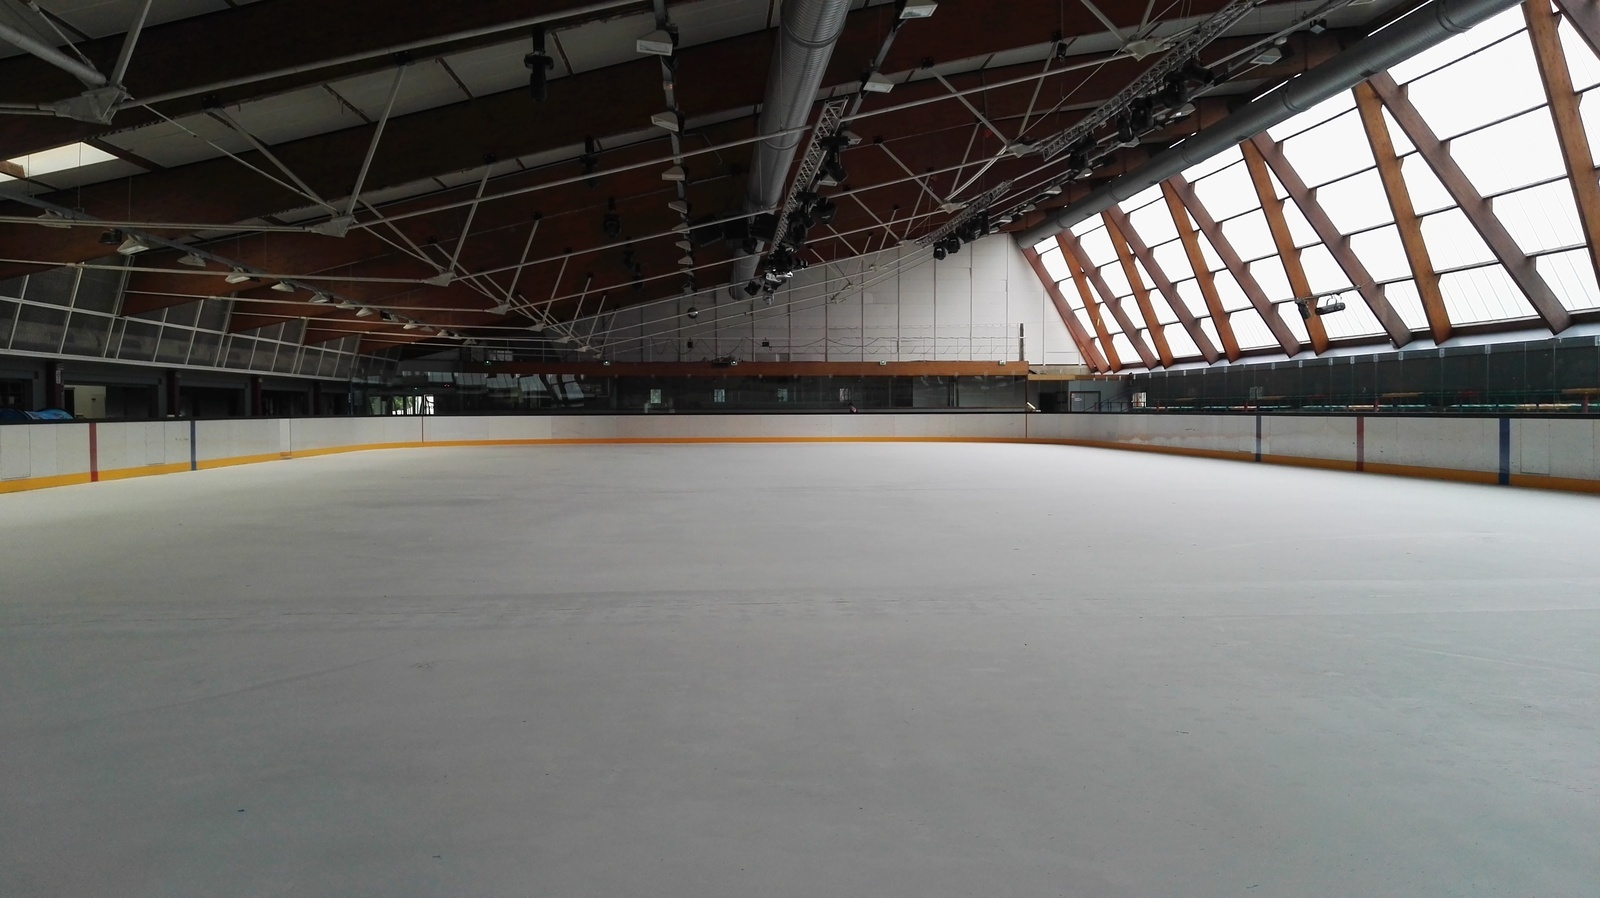 Marquage au sol - Tracé Terrain de hockey - Patinoire